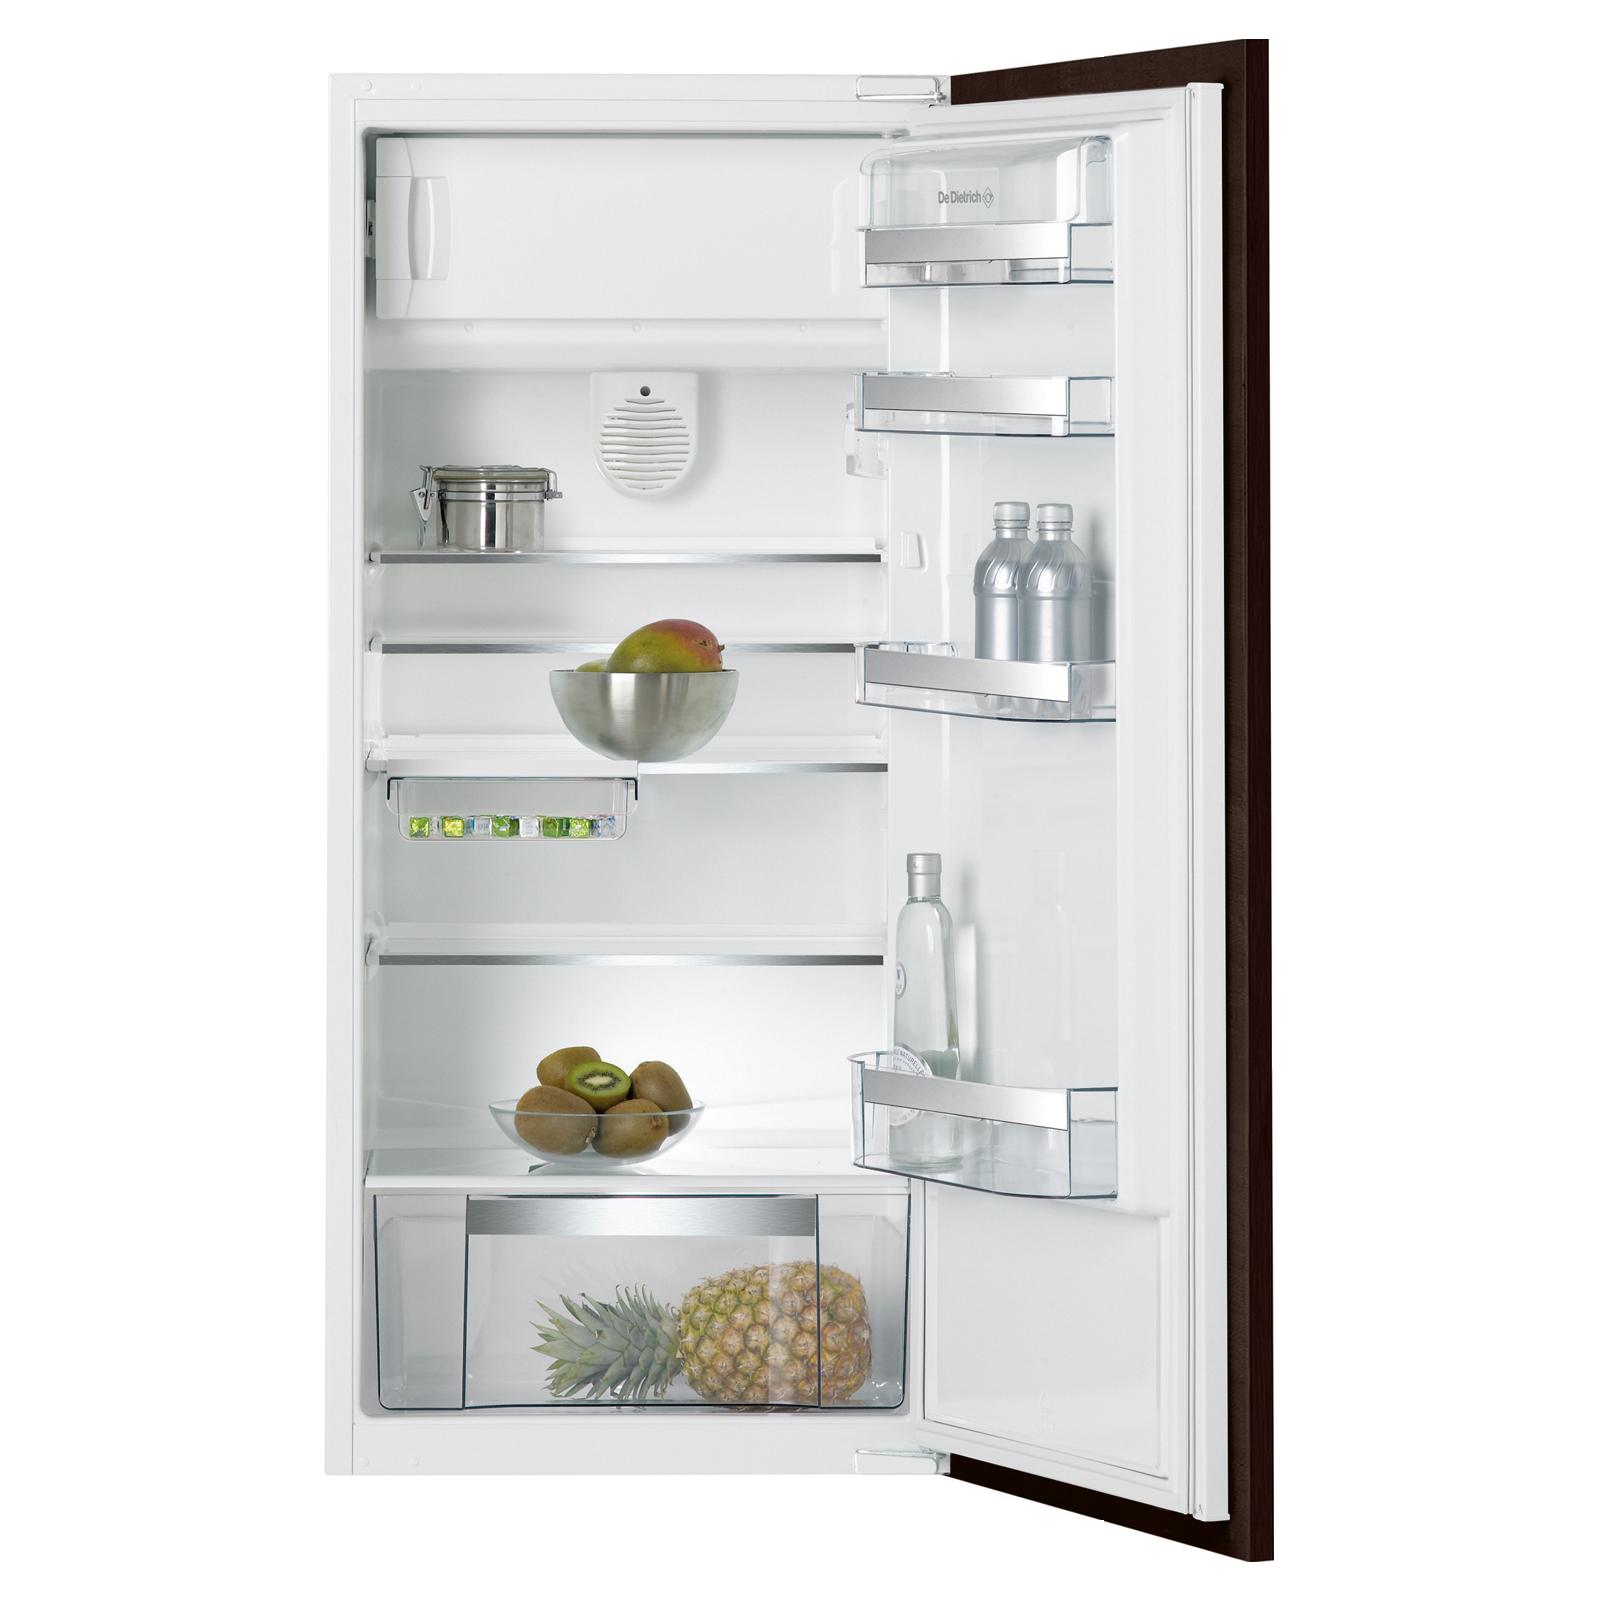 frigo americain integrable excellent samsung dvoile un rfrigrateur encastrable entirement. Black Bedroom Furniture Sets. Home Design Ideas